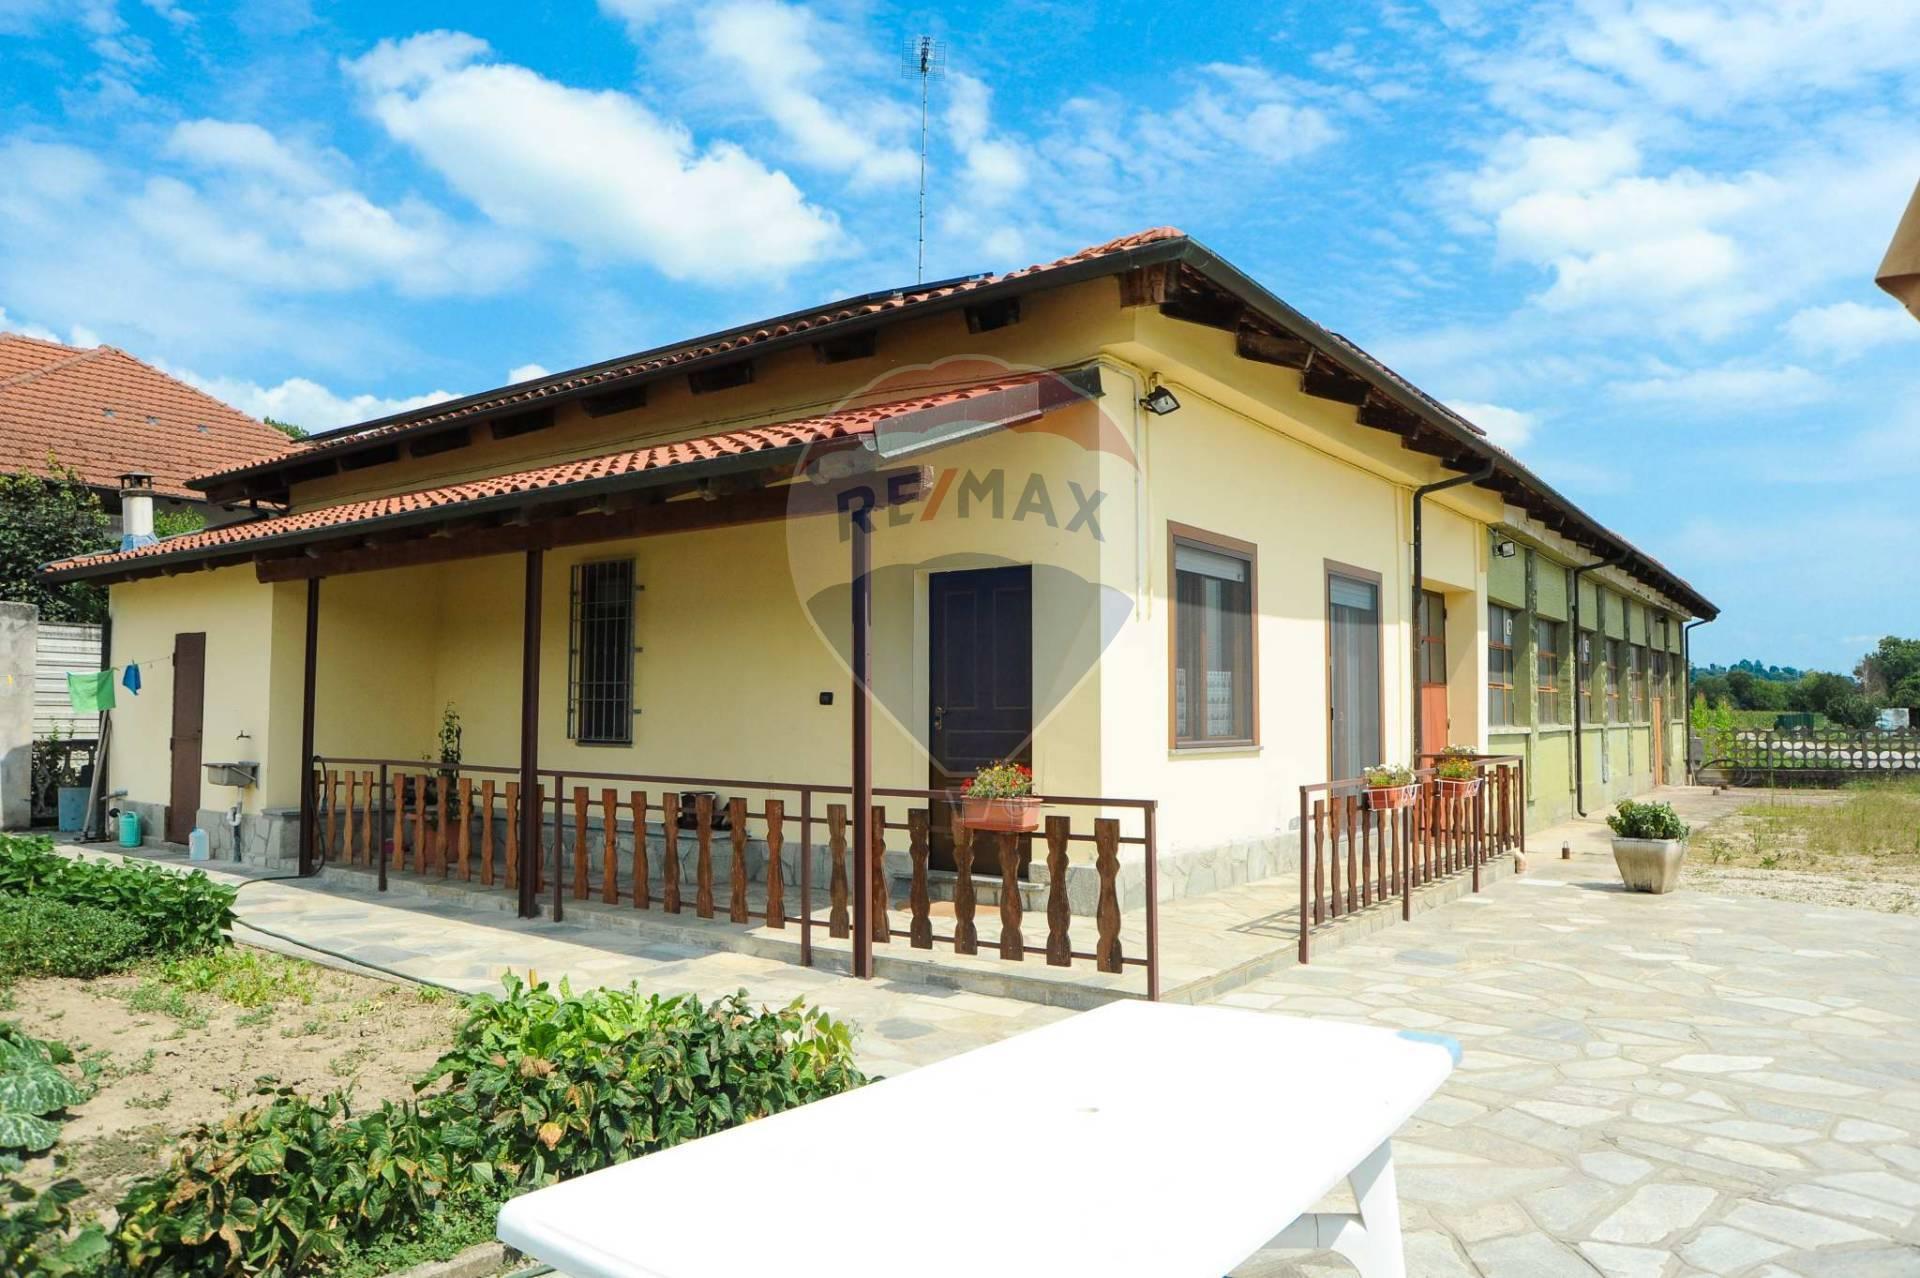 Vendita Casa Indipendente Casa/Villa Andezeno 262135